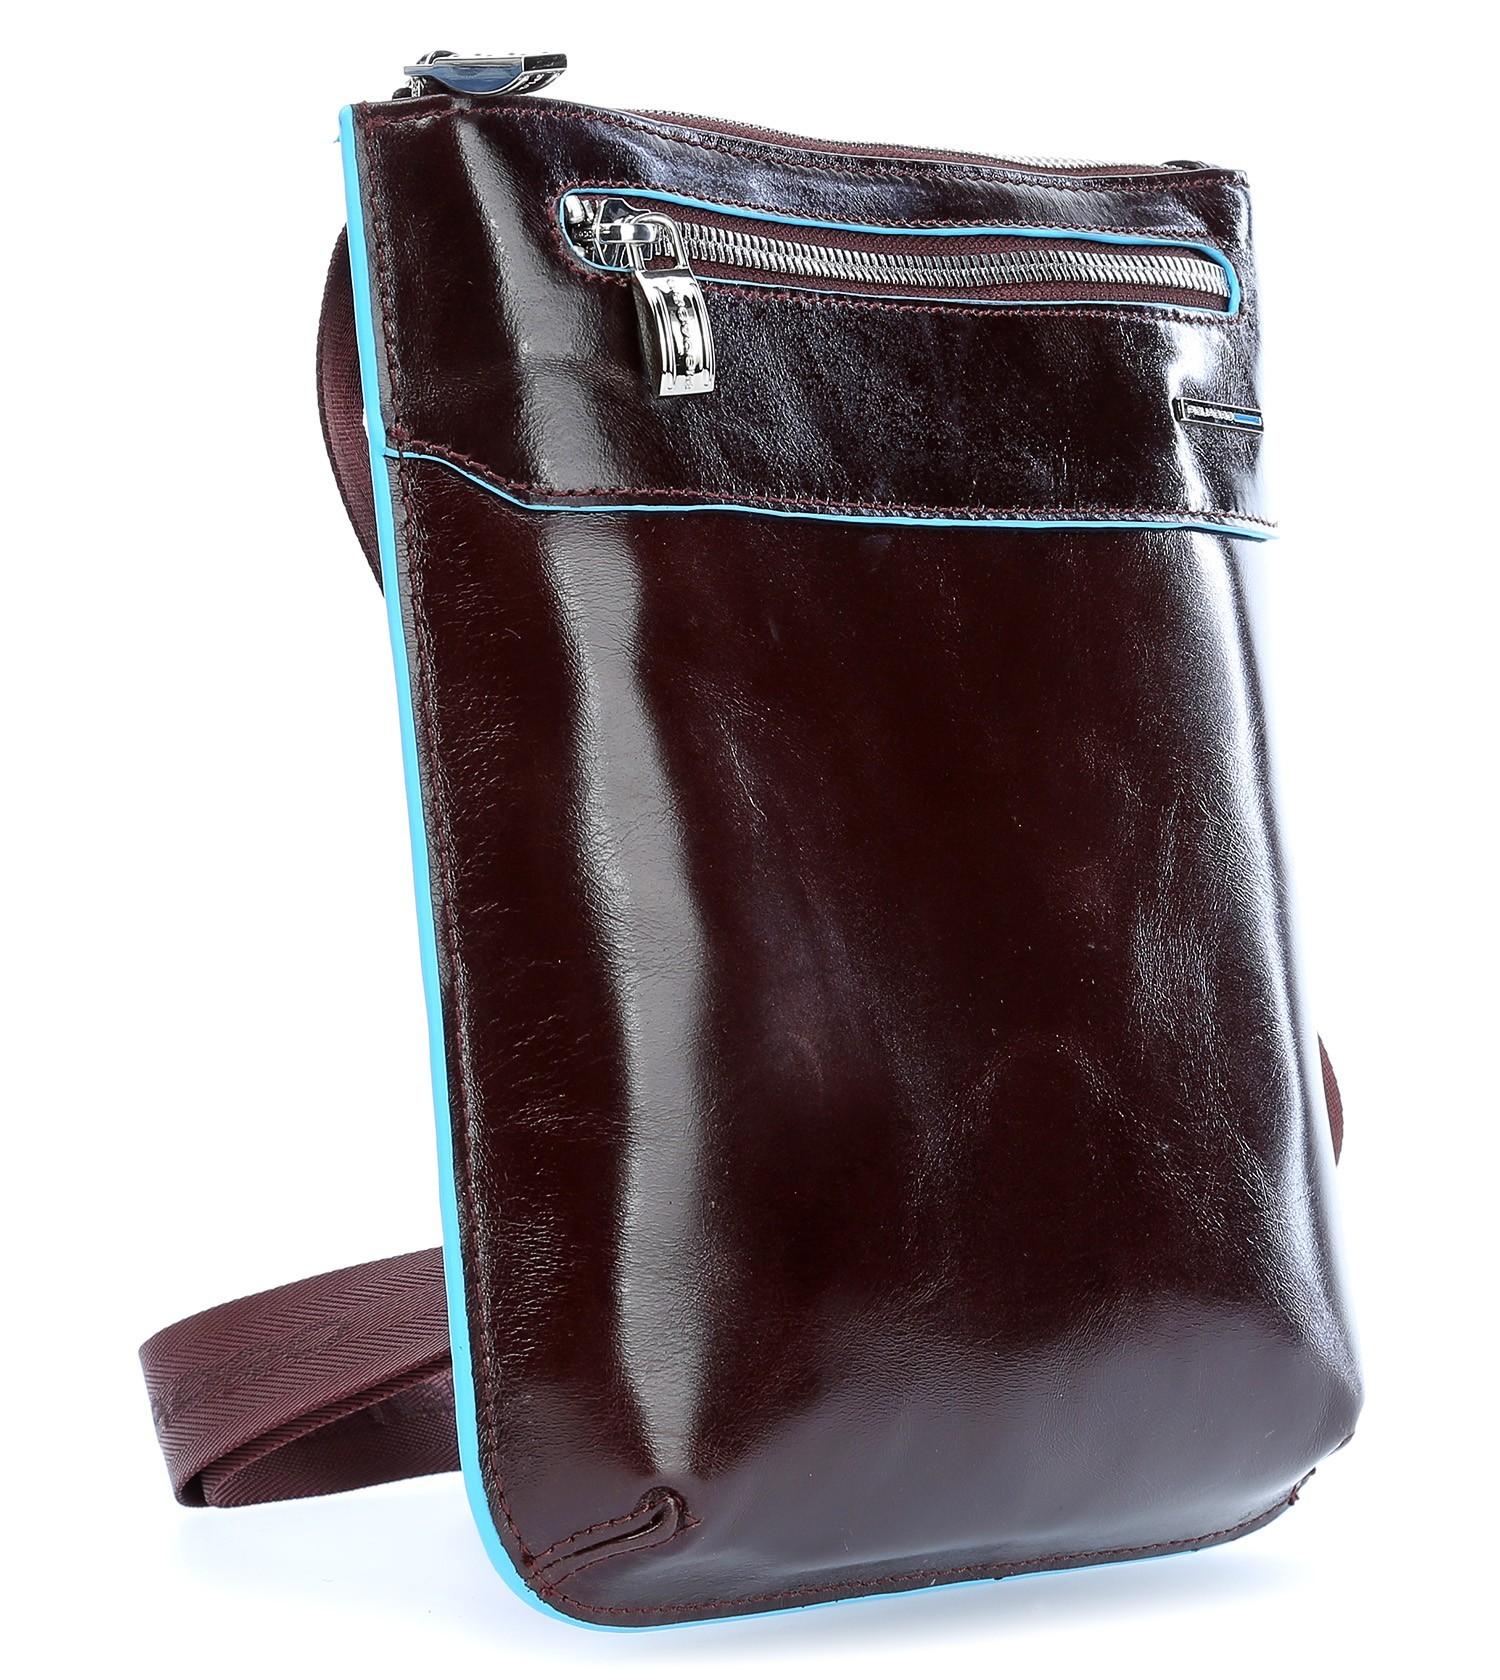 Сумка Piquadro Blue Square, цвет коричневый, 22x25x2 см (CA1358B2/MO)